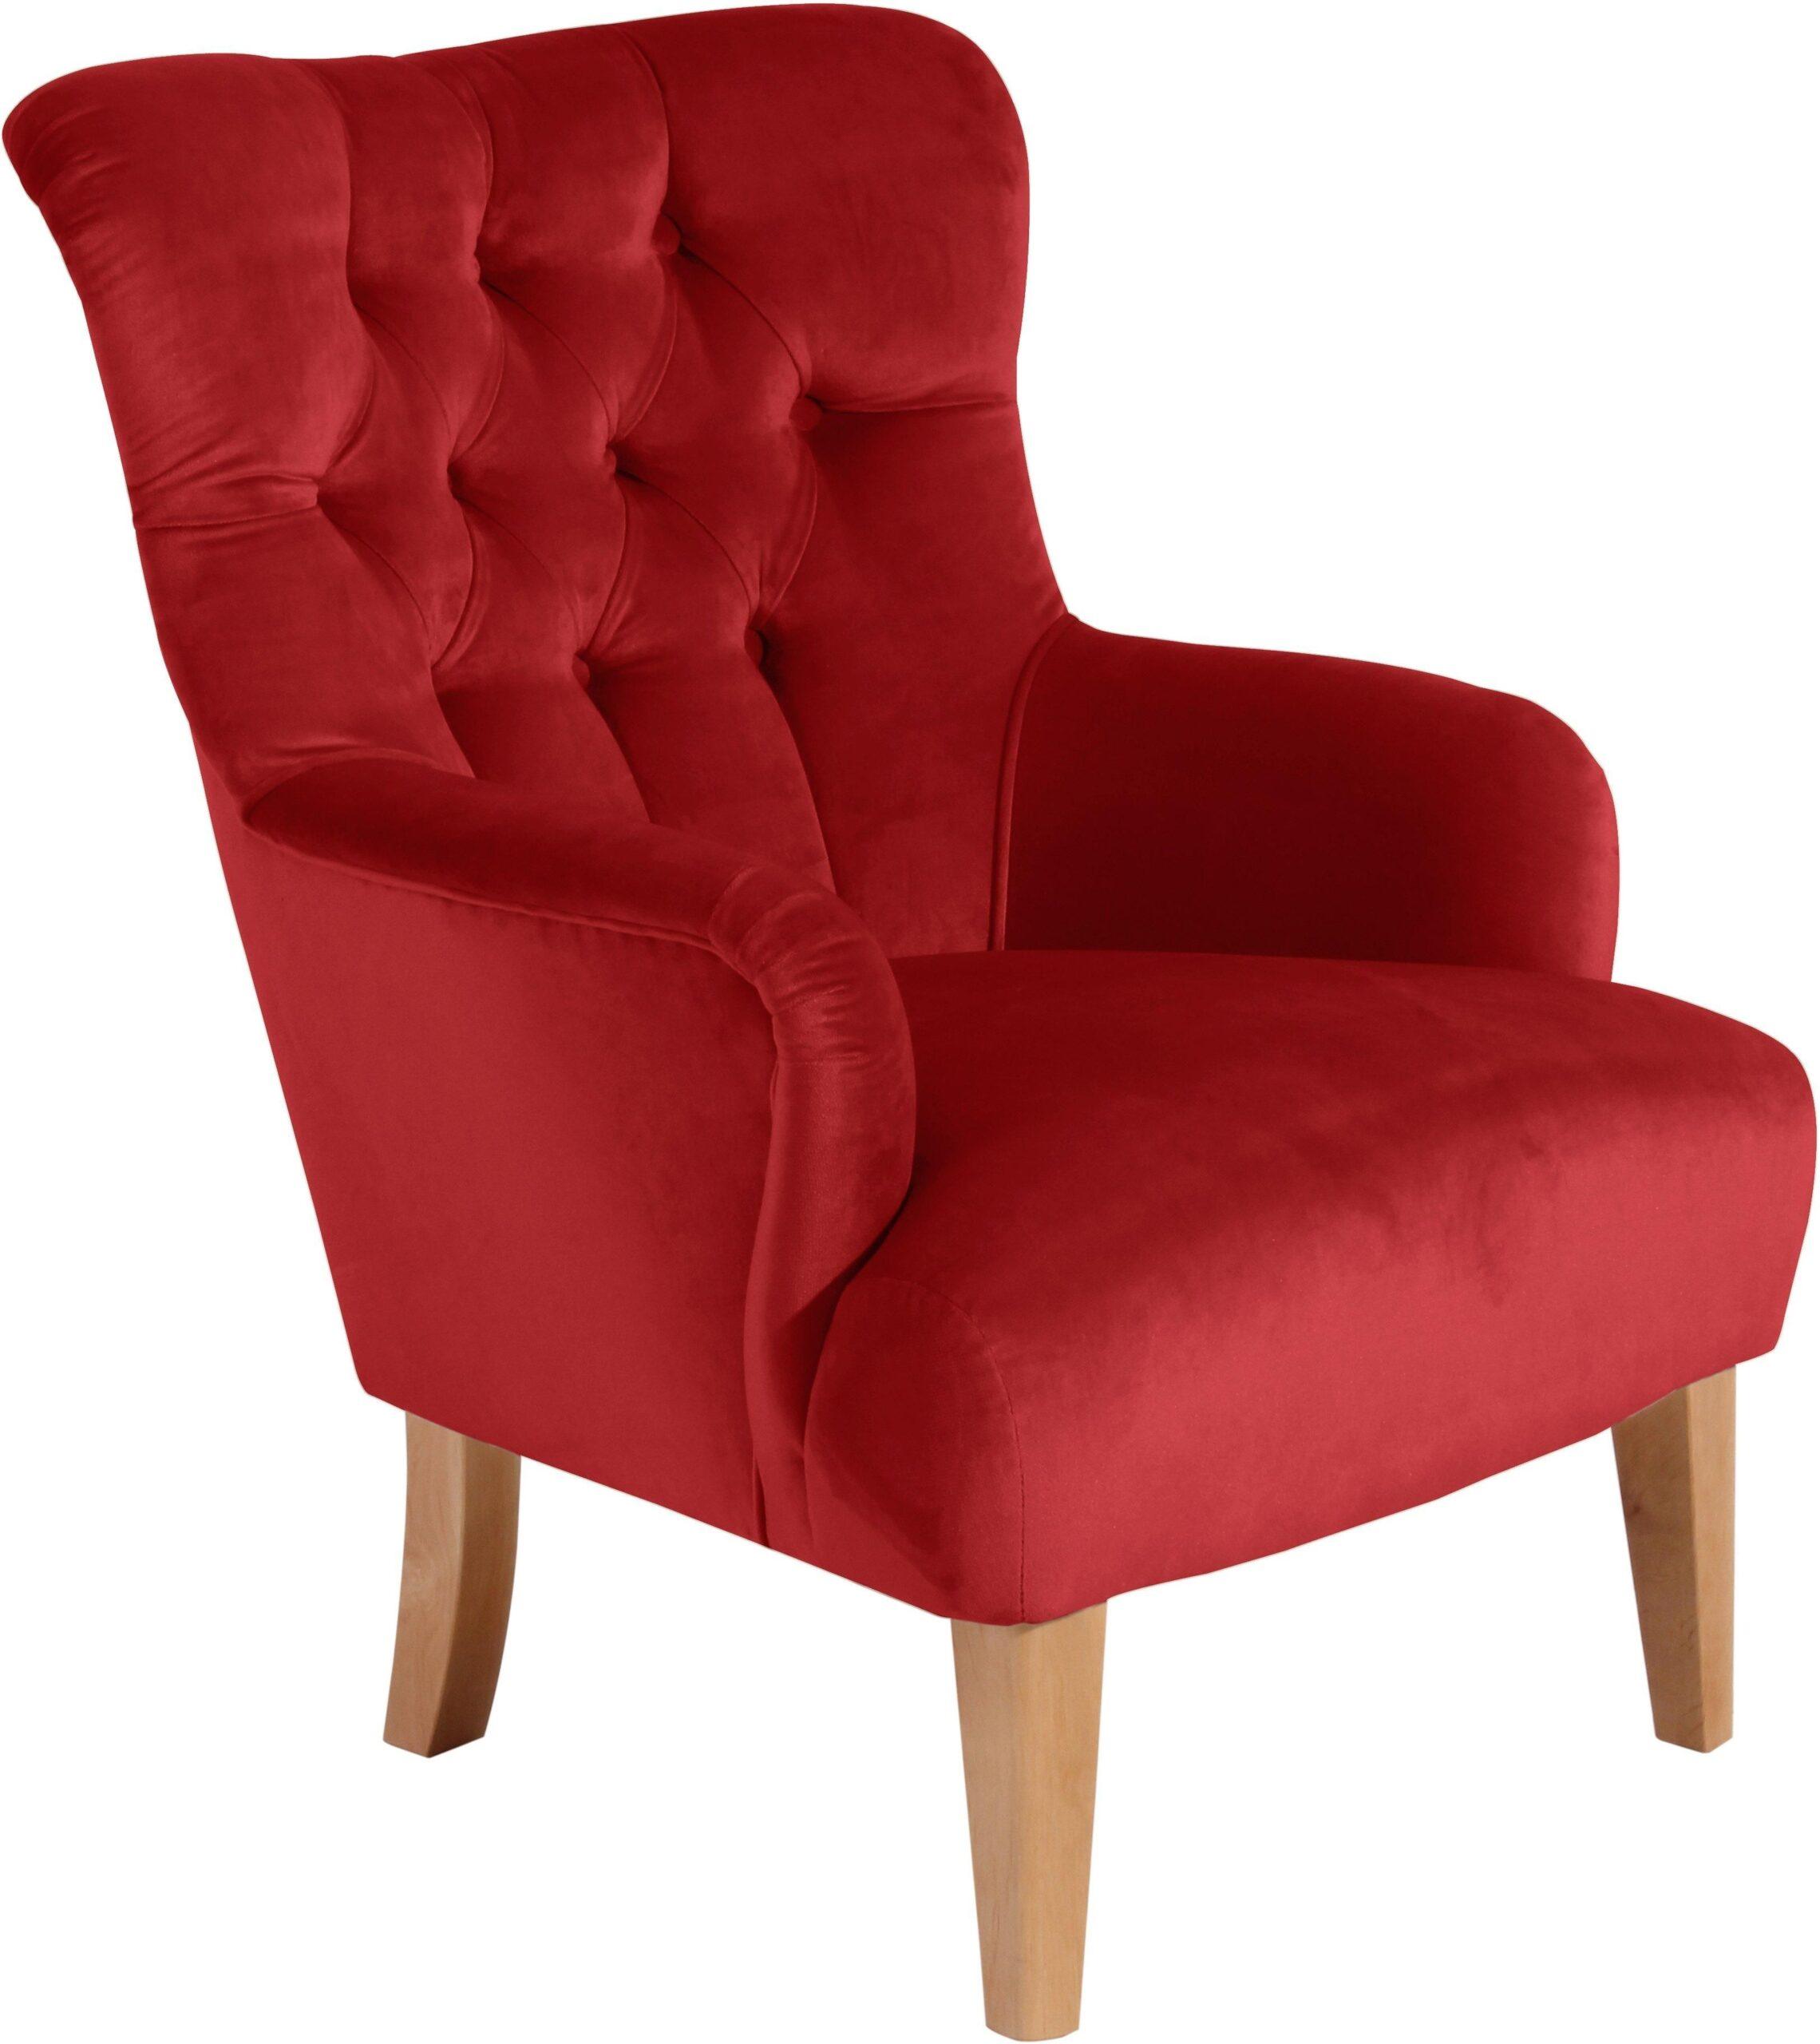 Full Size of Ikea Relaxsessel Mit Hocker Muren Leder Garten Strandmon Elektrisch Sessel Schlafsessel Lycksele Lvs Ohrensessel Modern Xxl Küche Kaufen Miniküche Wohnzimmer Ikea Relaxsessel